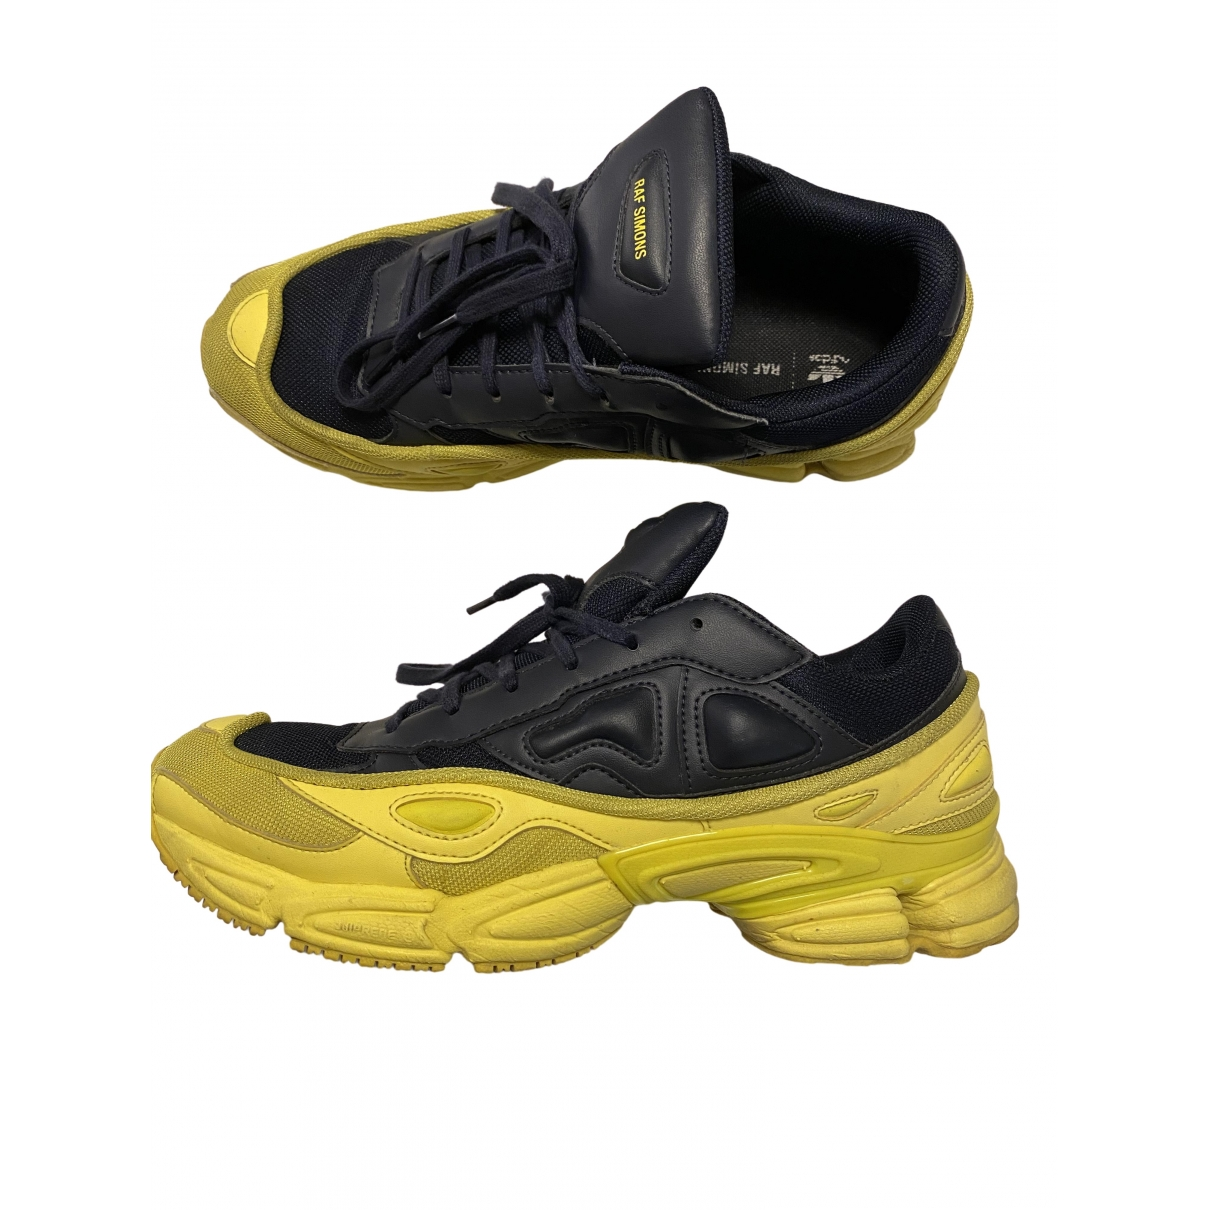 Adidas X Raf Simons - Baskets Ozweego 2 pour homme en caoutchouc - jaune